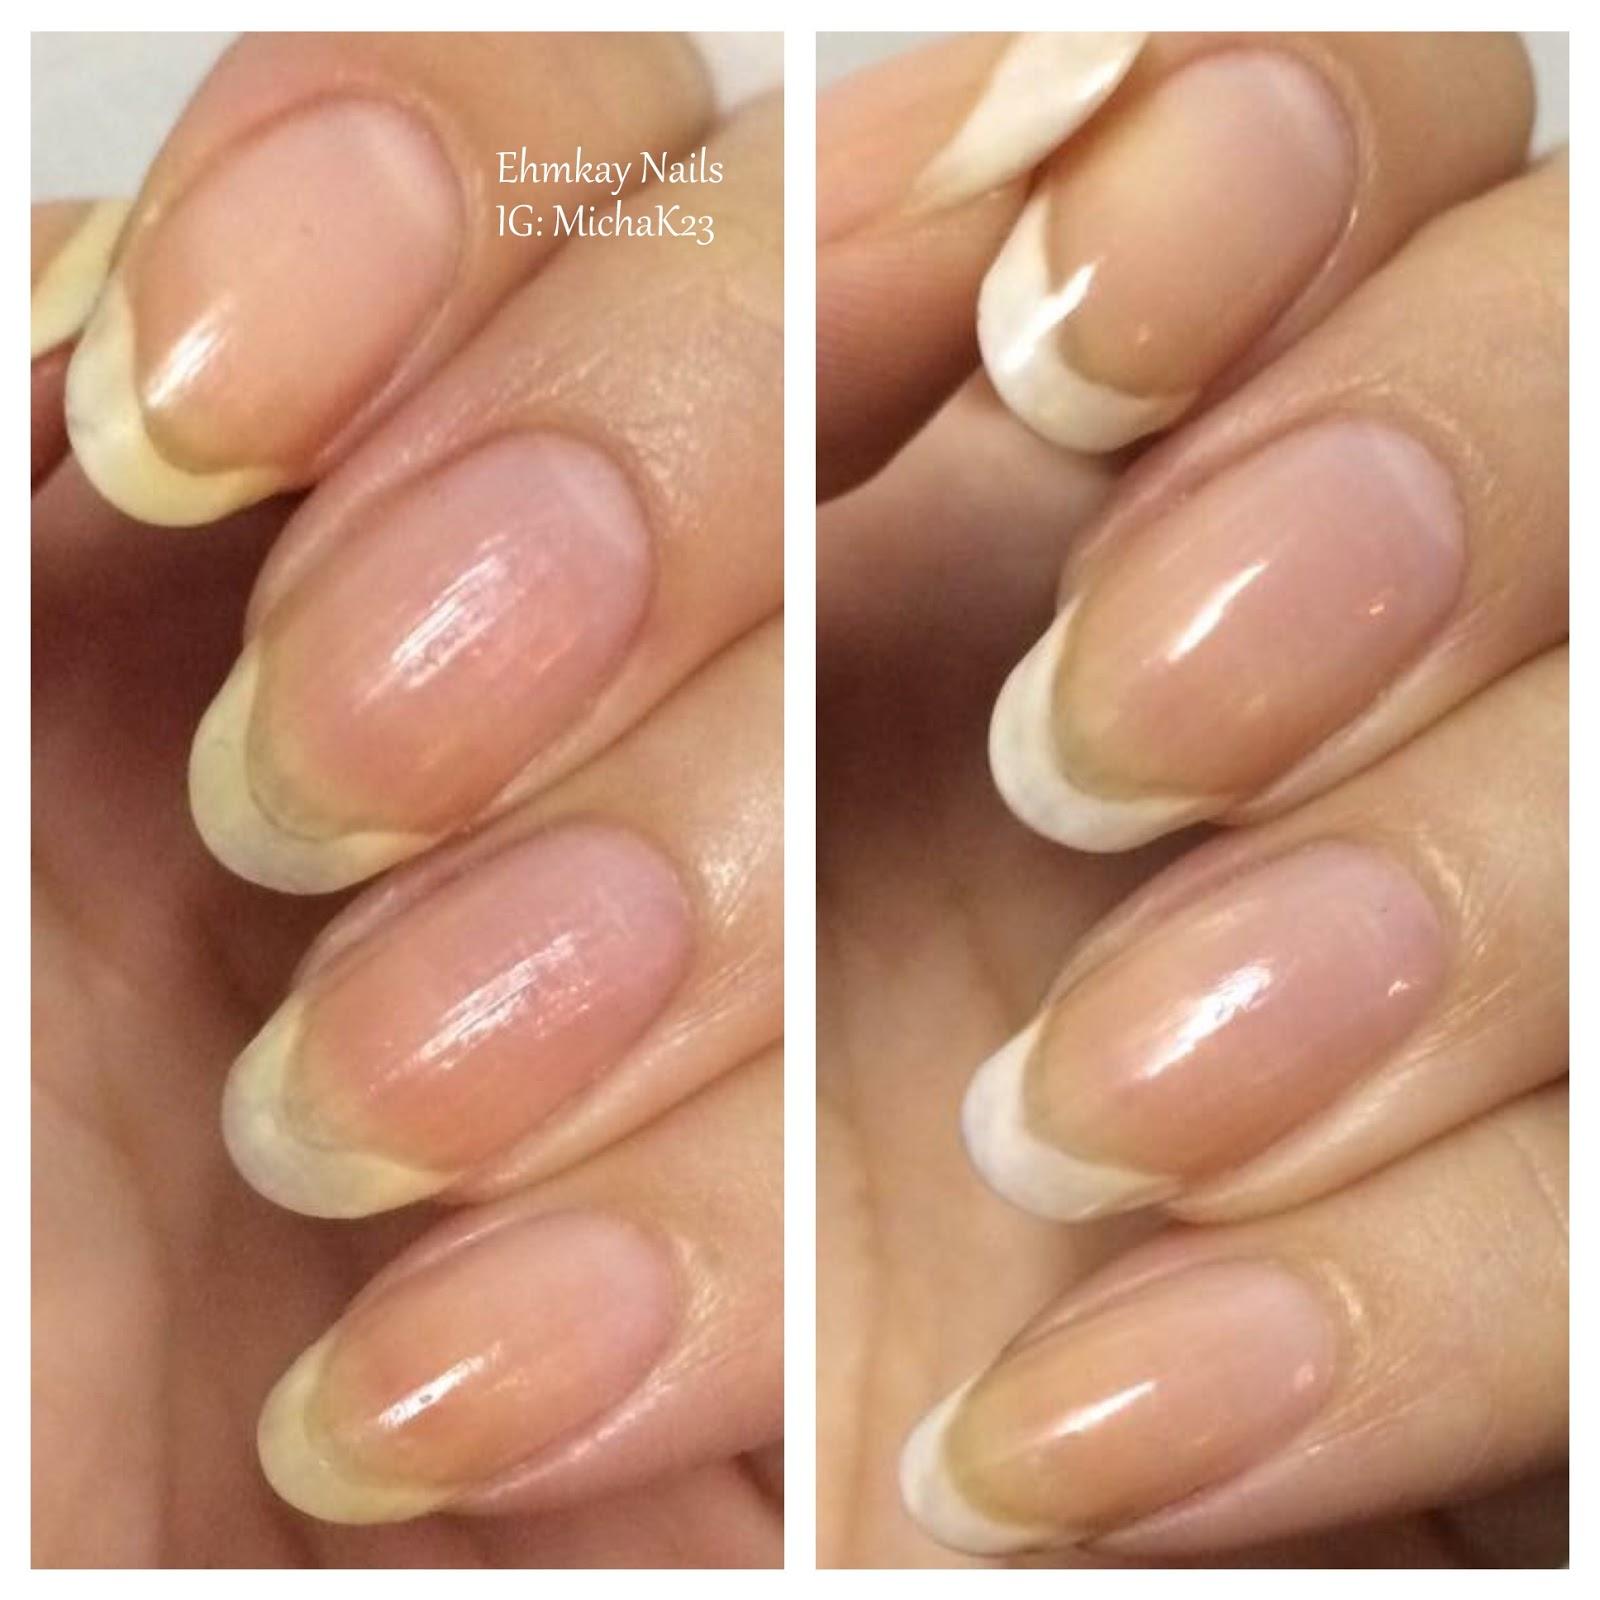 Nail Treatment: Zoya Naked Manicure